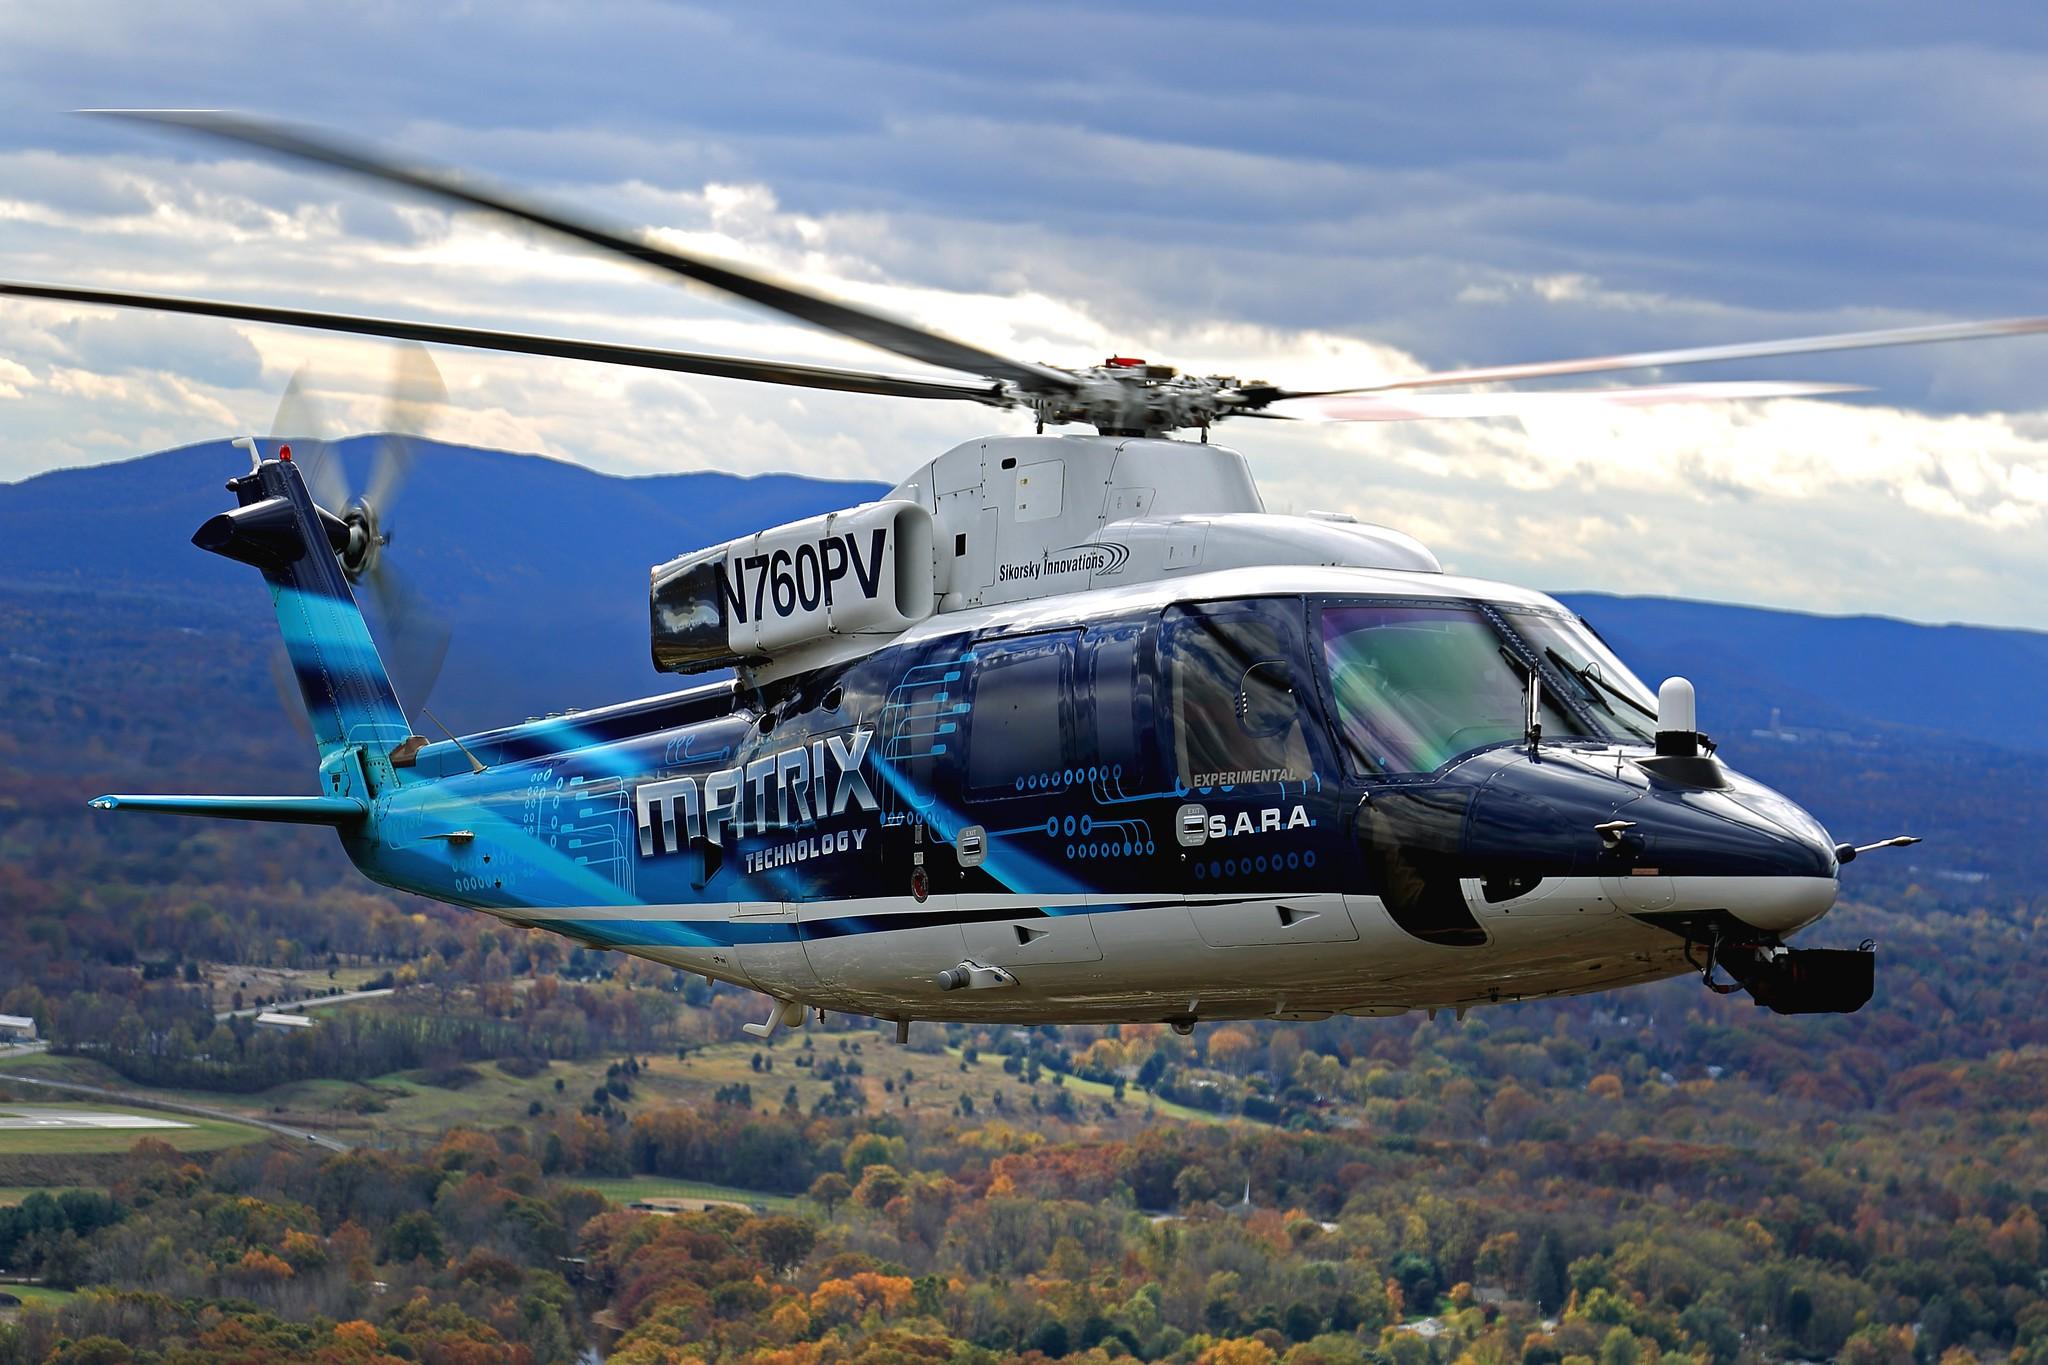 Sikorsky SARA with Matrix technology